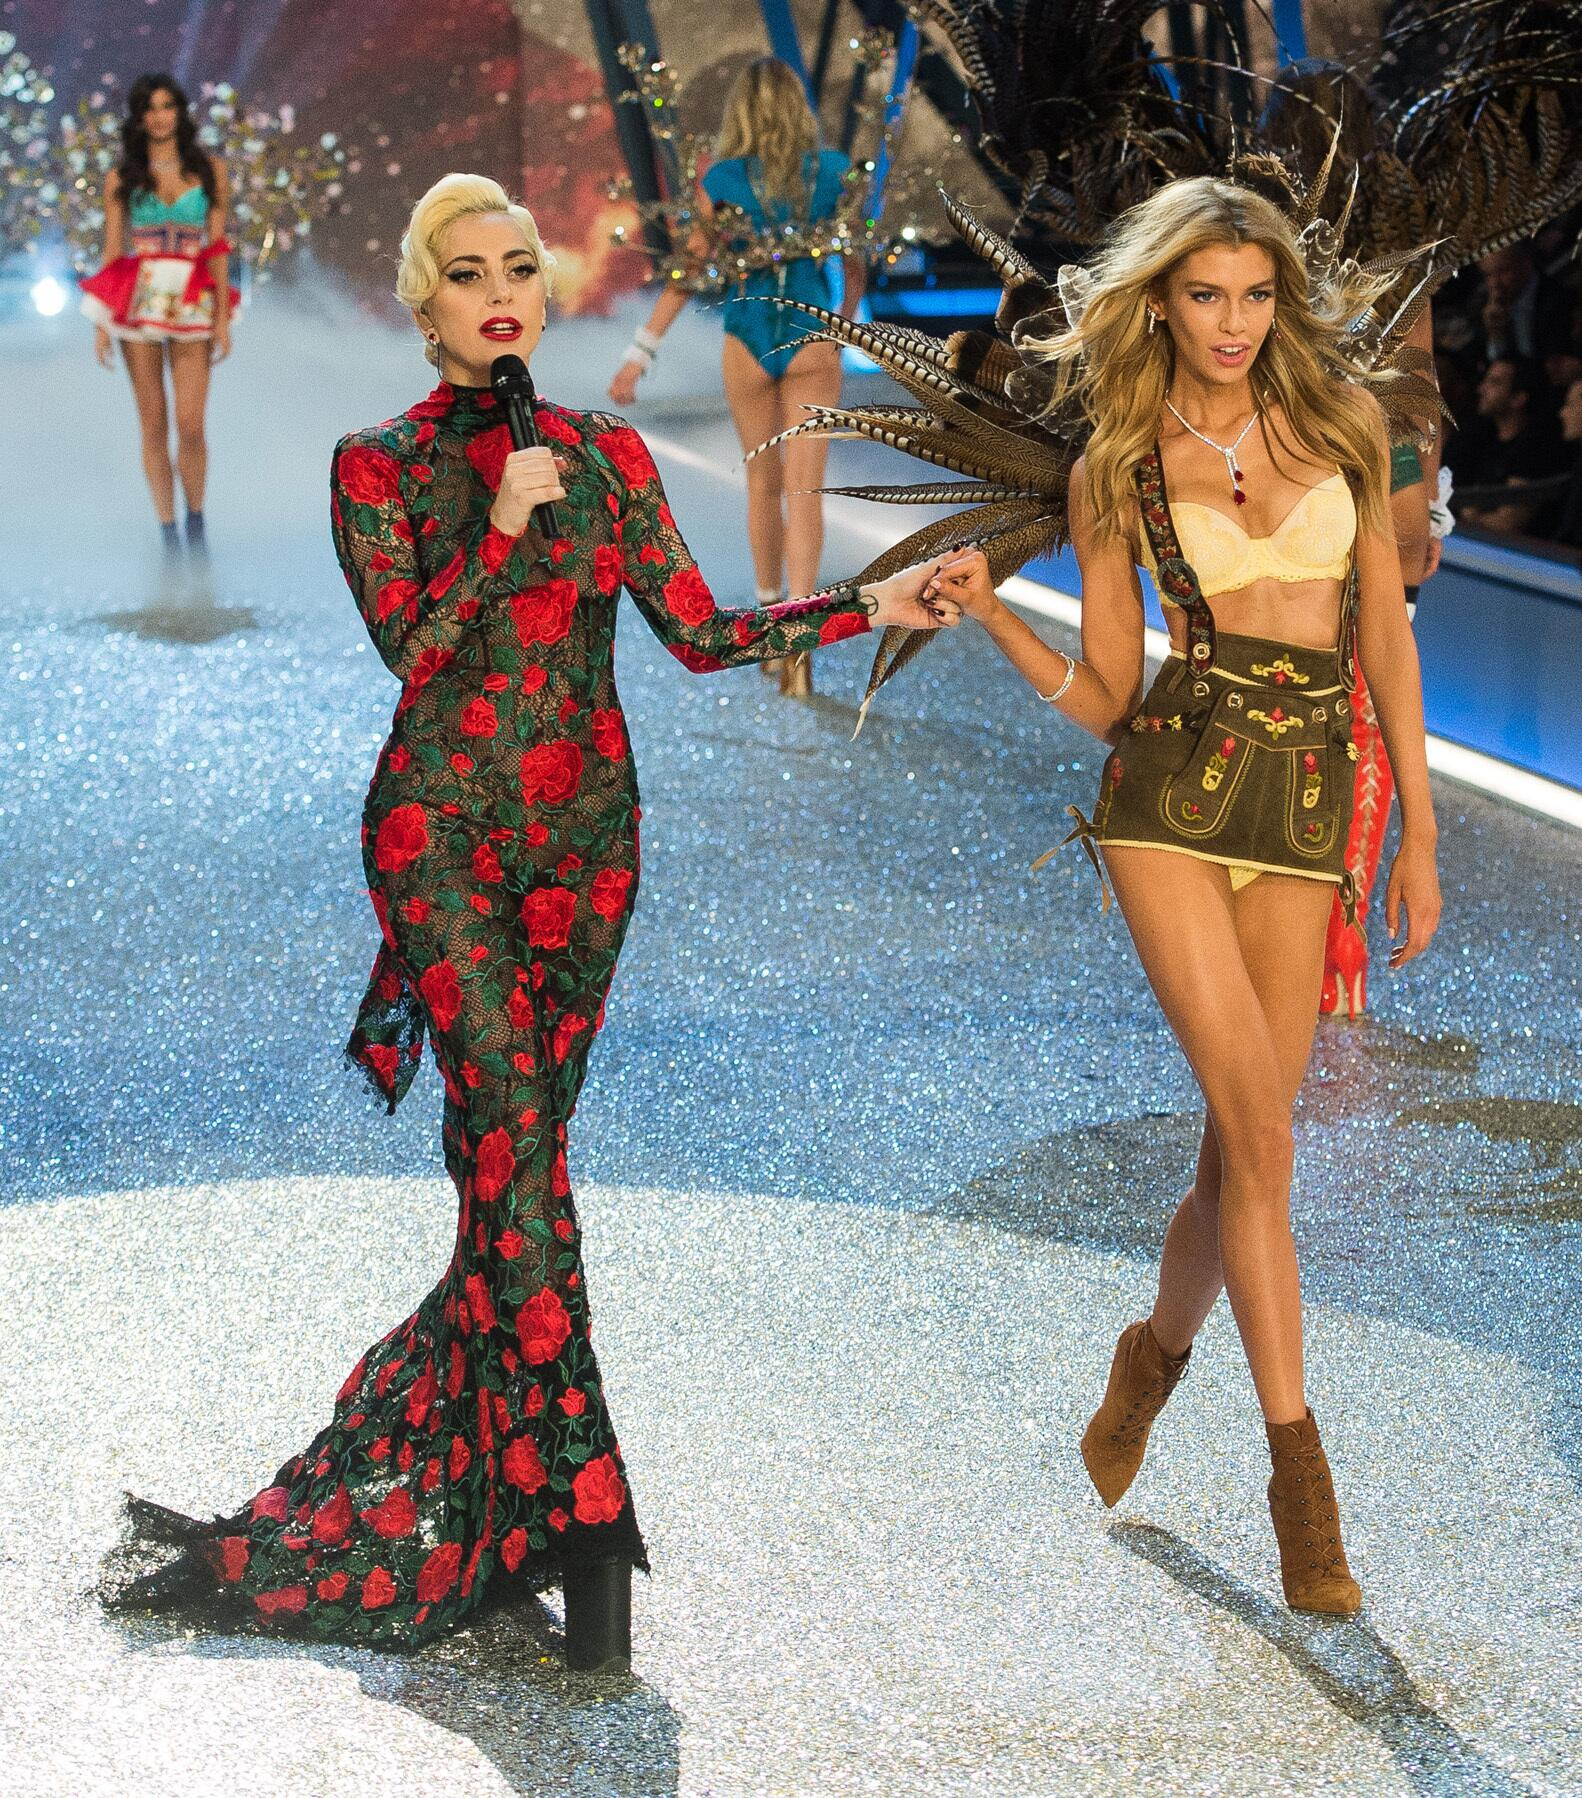 Bild zu Victoria's Secret, Paris 2016, Catwalk, Stella Maxwell, Lady Gaga